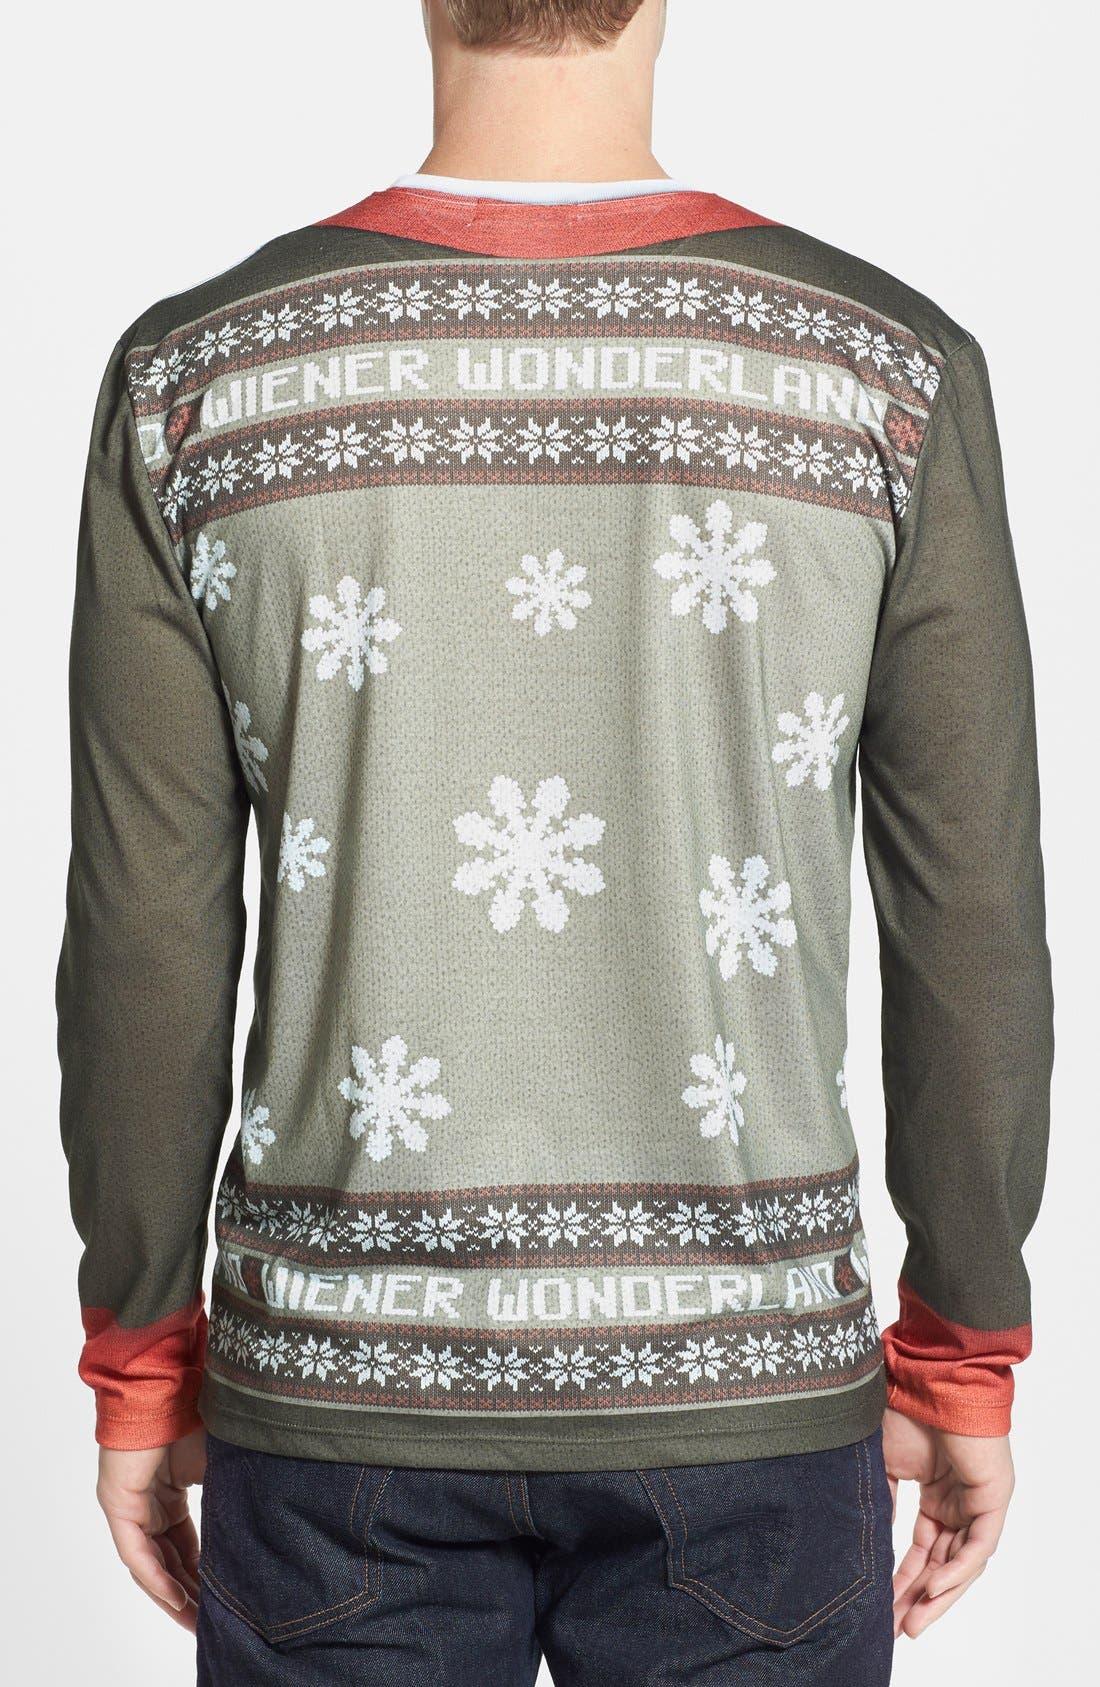 FAUX REAL,                             'Wiener Wonderland' Ugly Christmas Long Sleeve Novelty T-Shirt,                             Alternate thumbnail 5, color,                             200